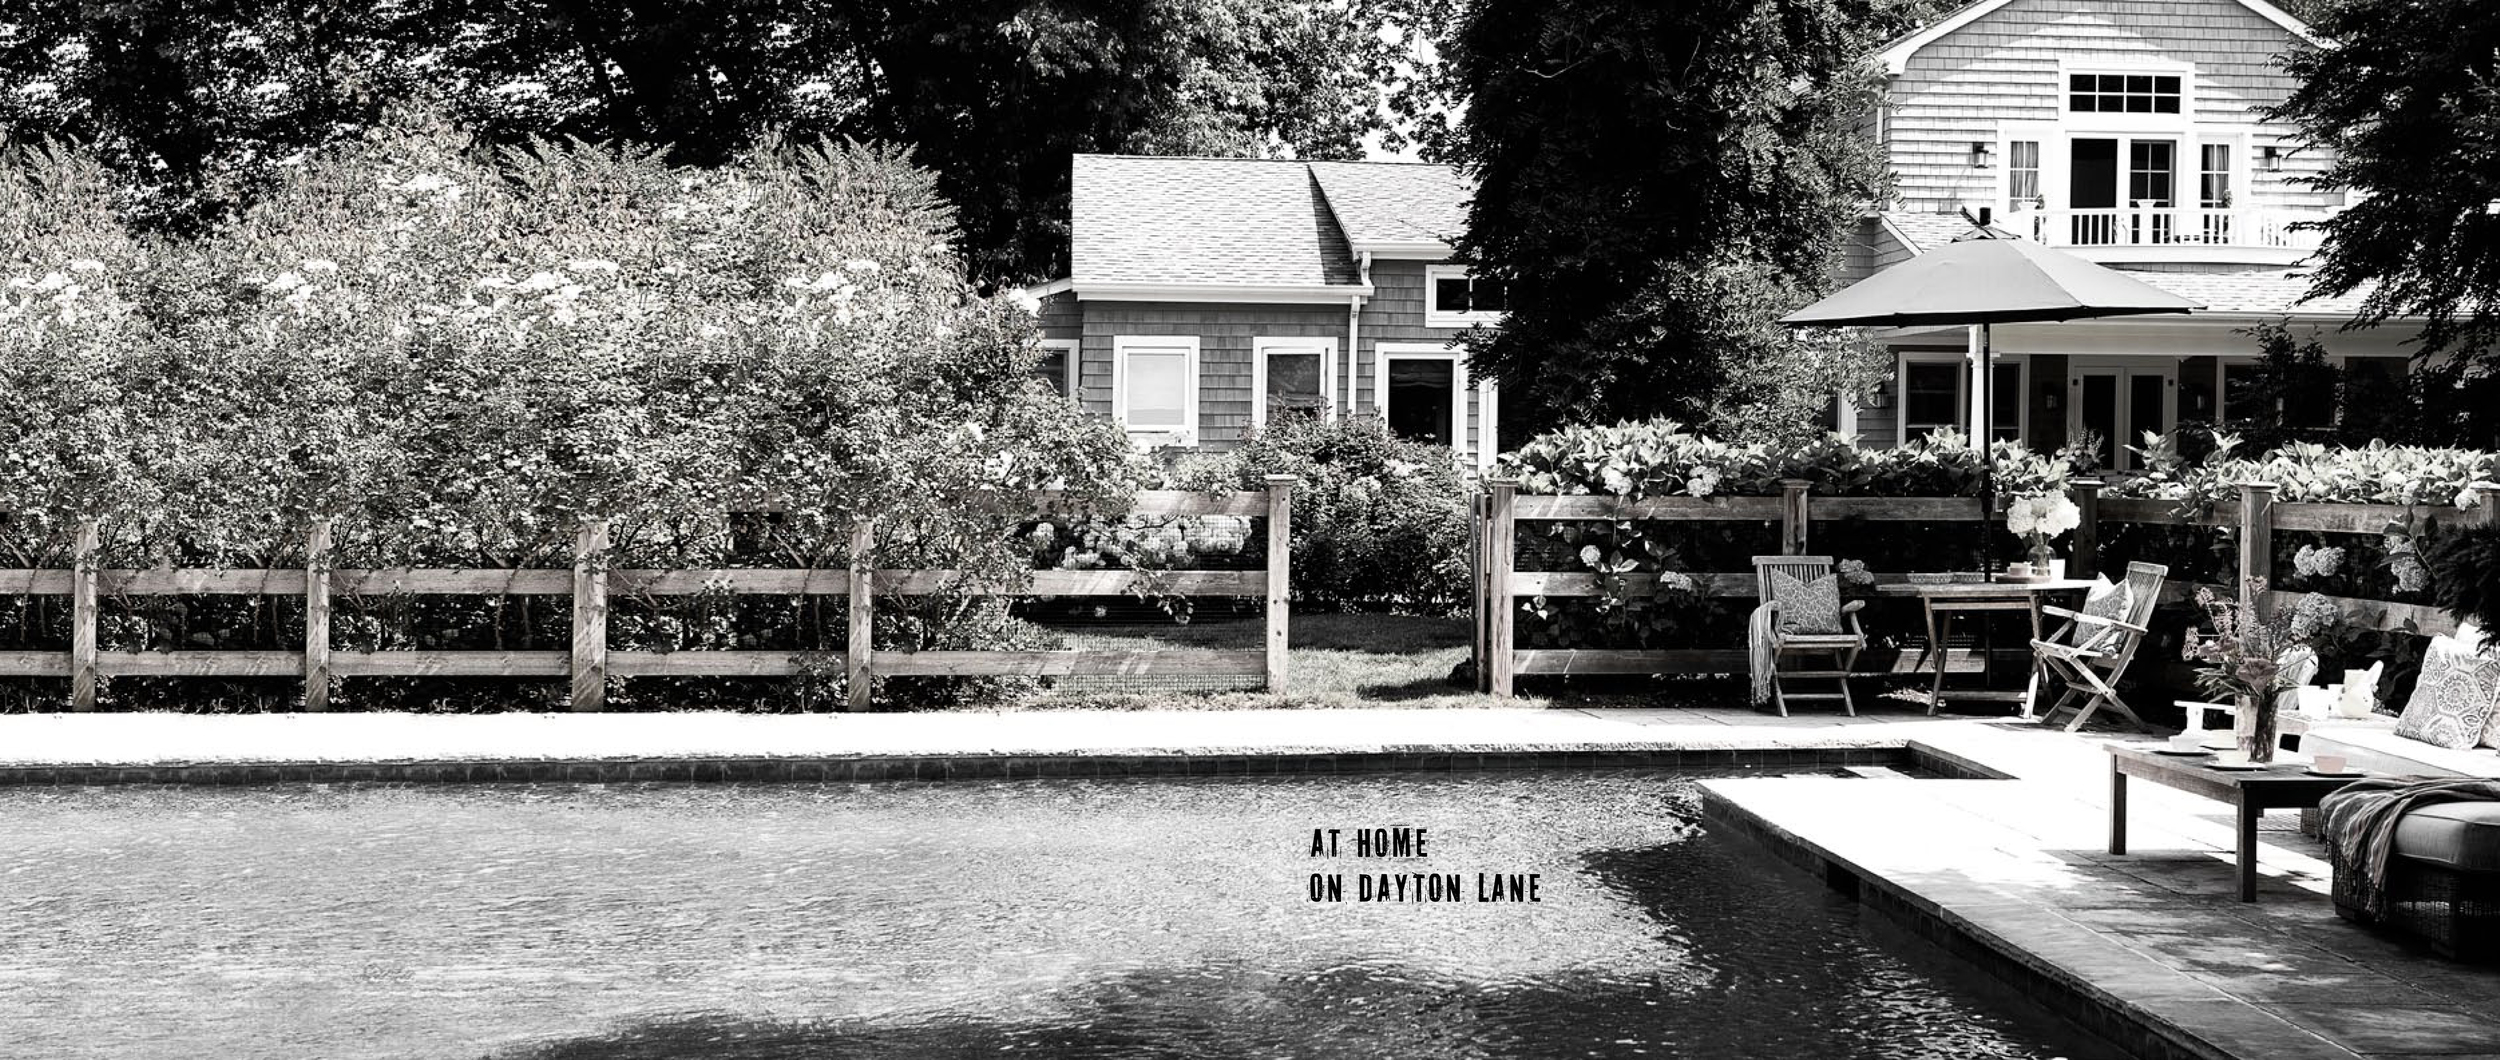 7-AT HOME ON DAYTON LANE Cover.jpg